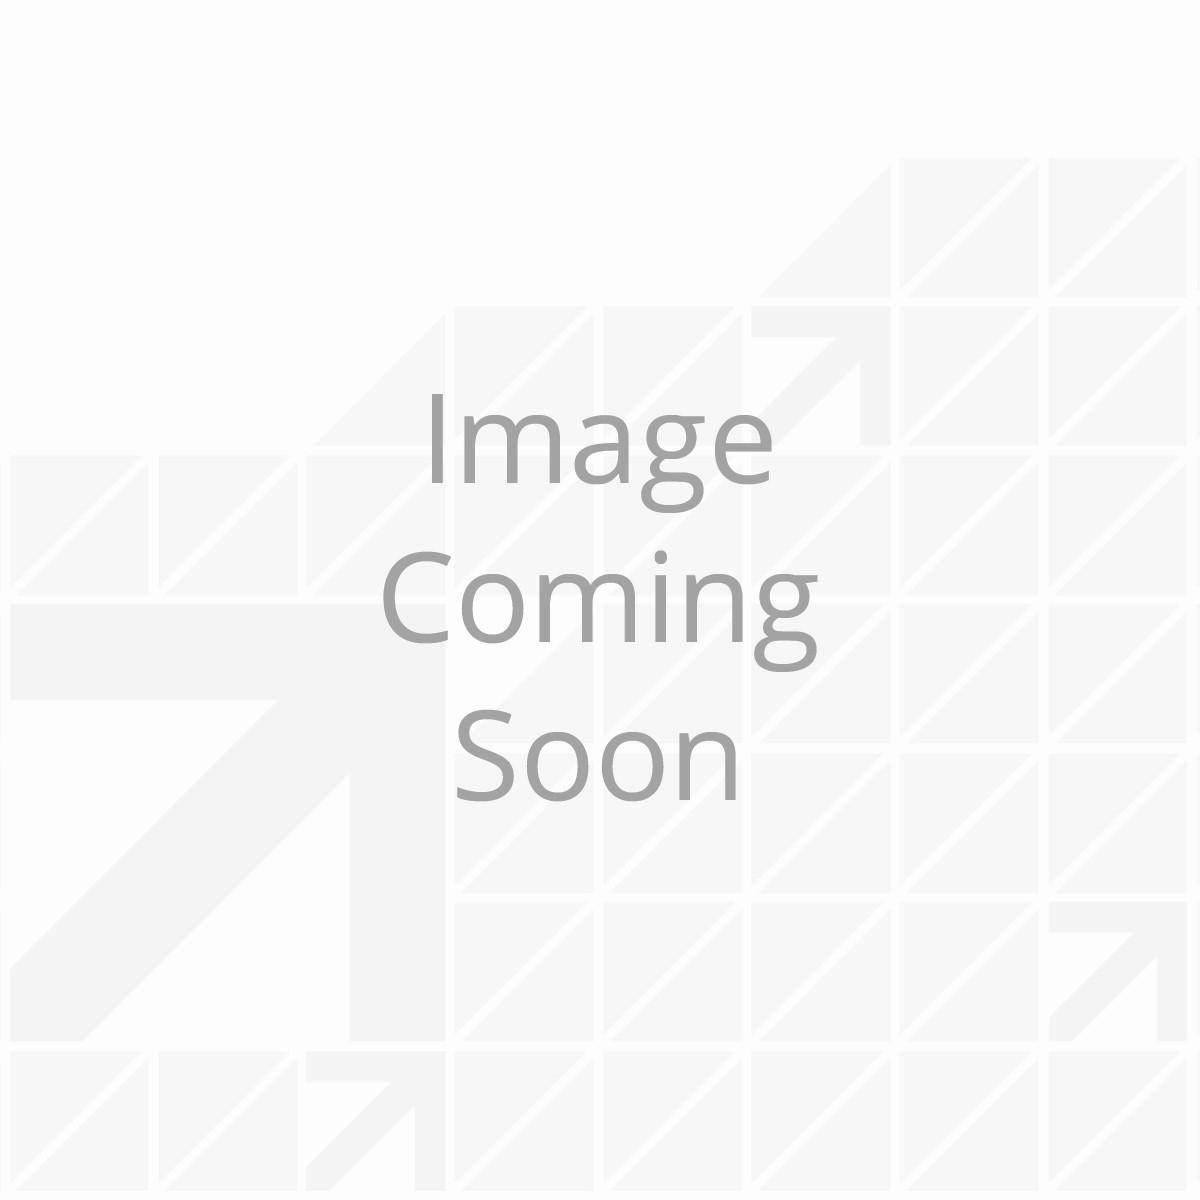 Coupler Motor for Steel Torque Shaft